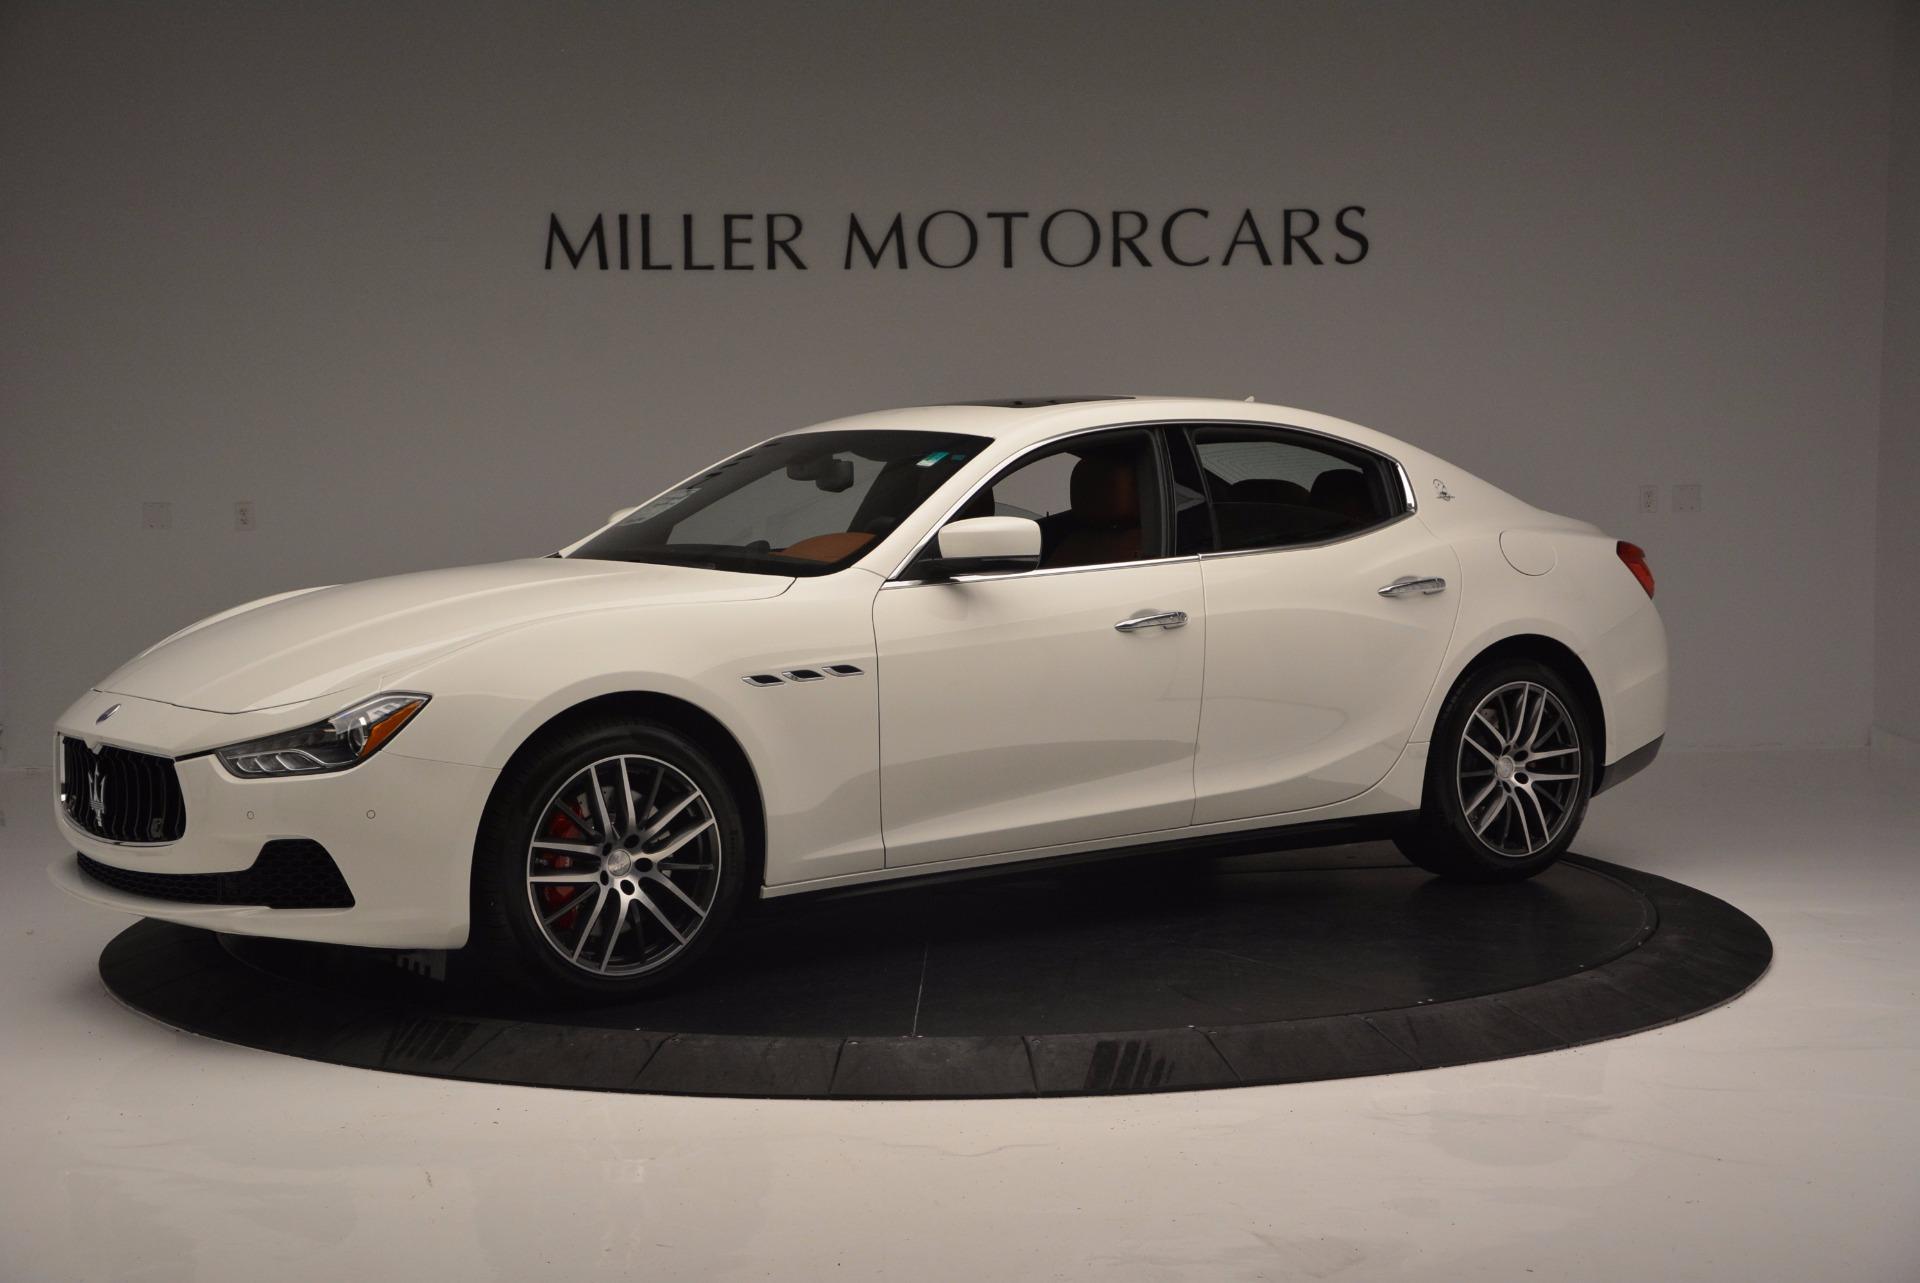 Used 2017 Maserati Ghibli S Q4 Ex-Loaner For Sale In Greenwich, CT 1166_p2